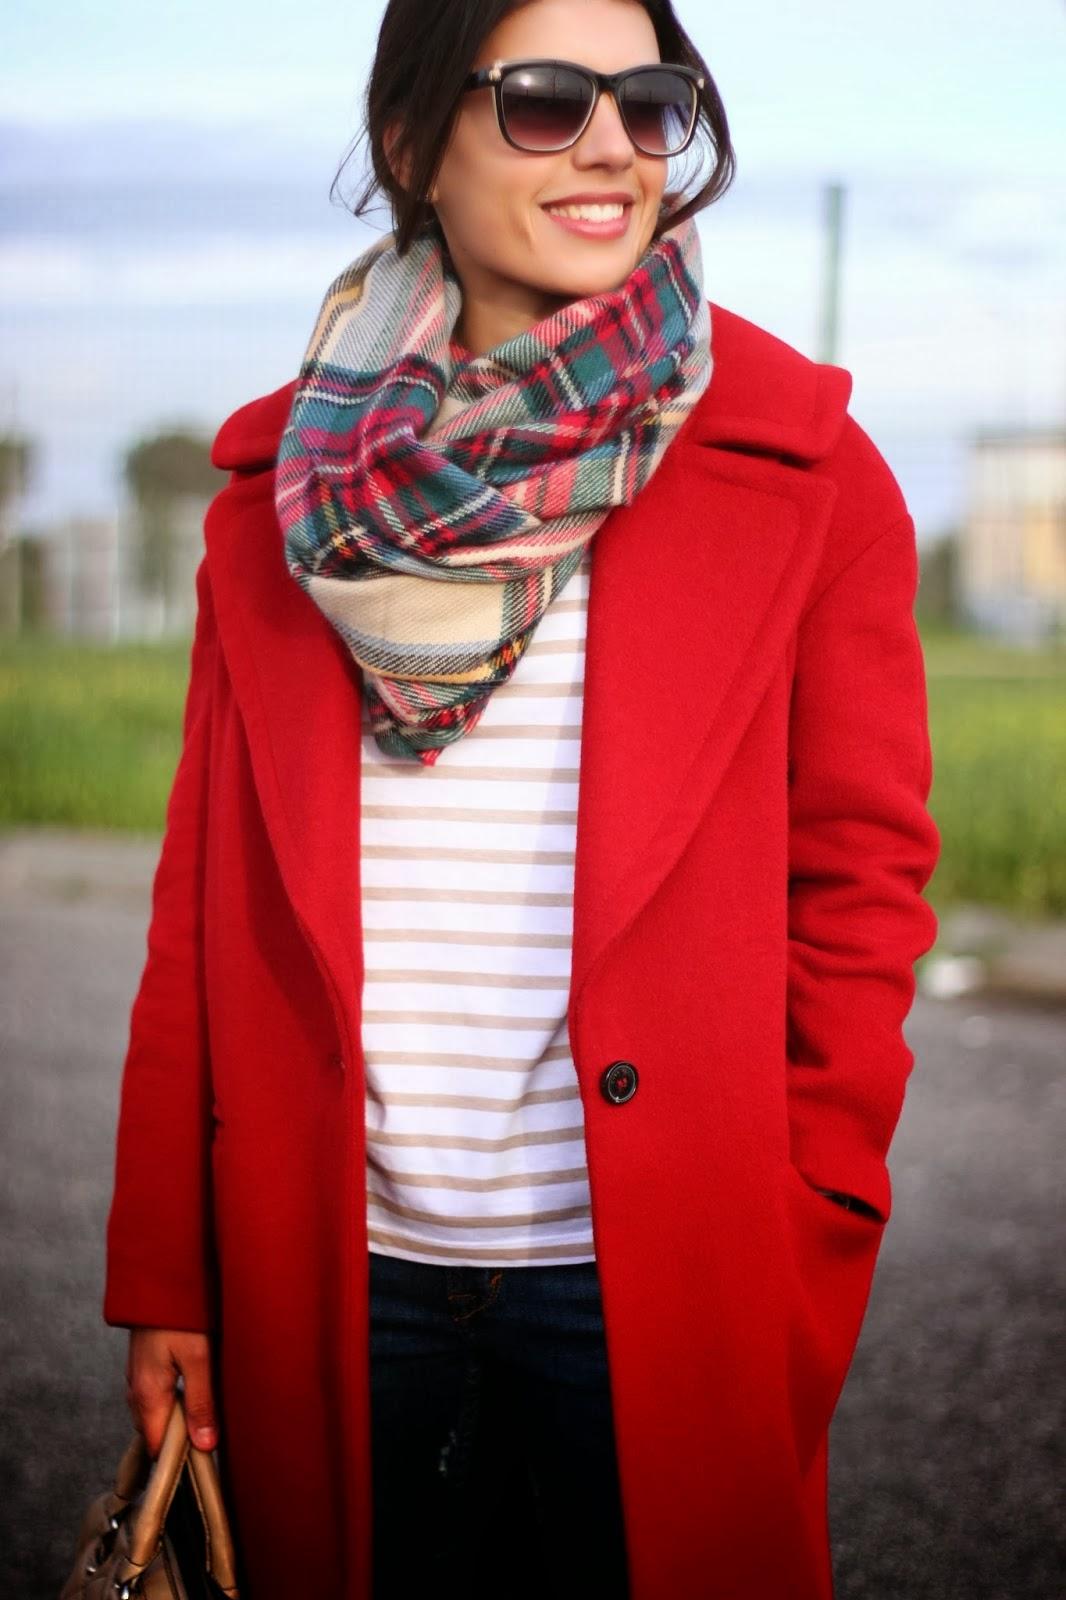 http://ilovefitametrica.blogspot.pt/2014/01/plaid-scarf.html